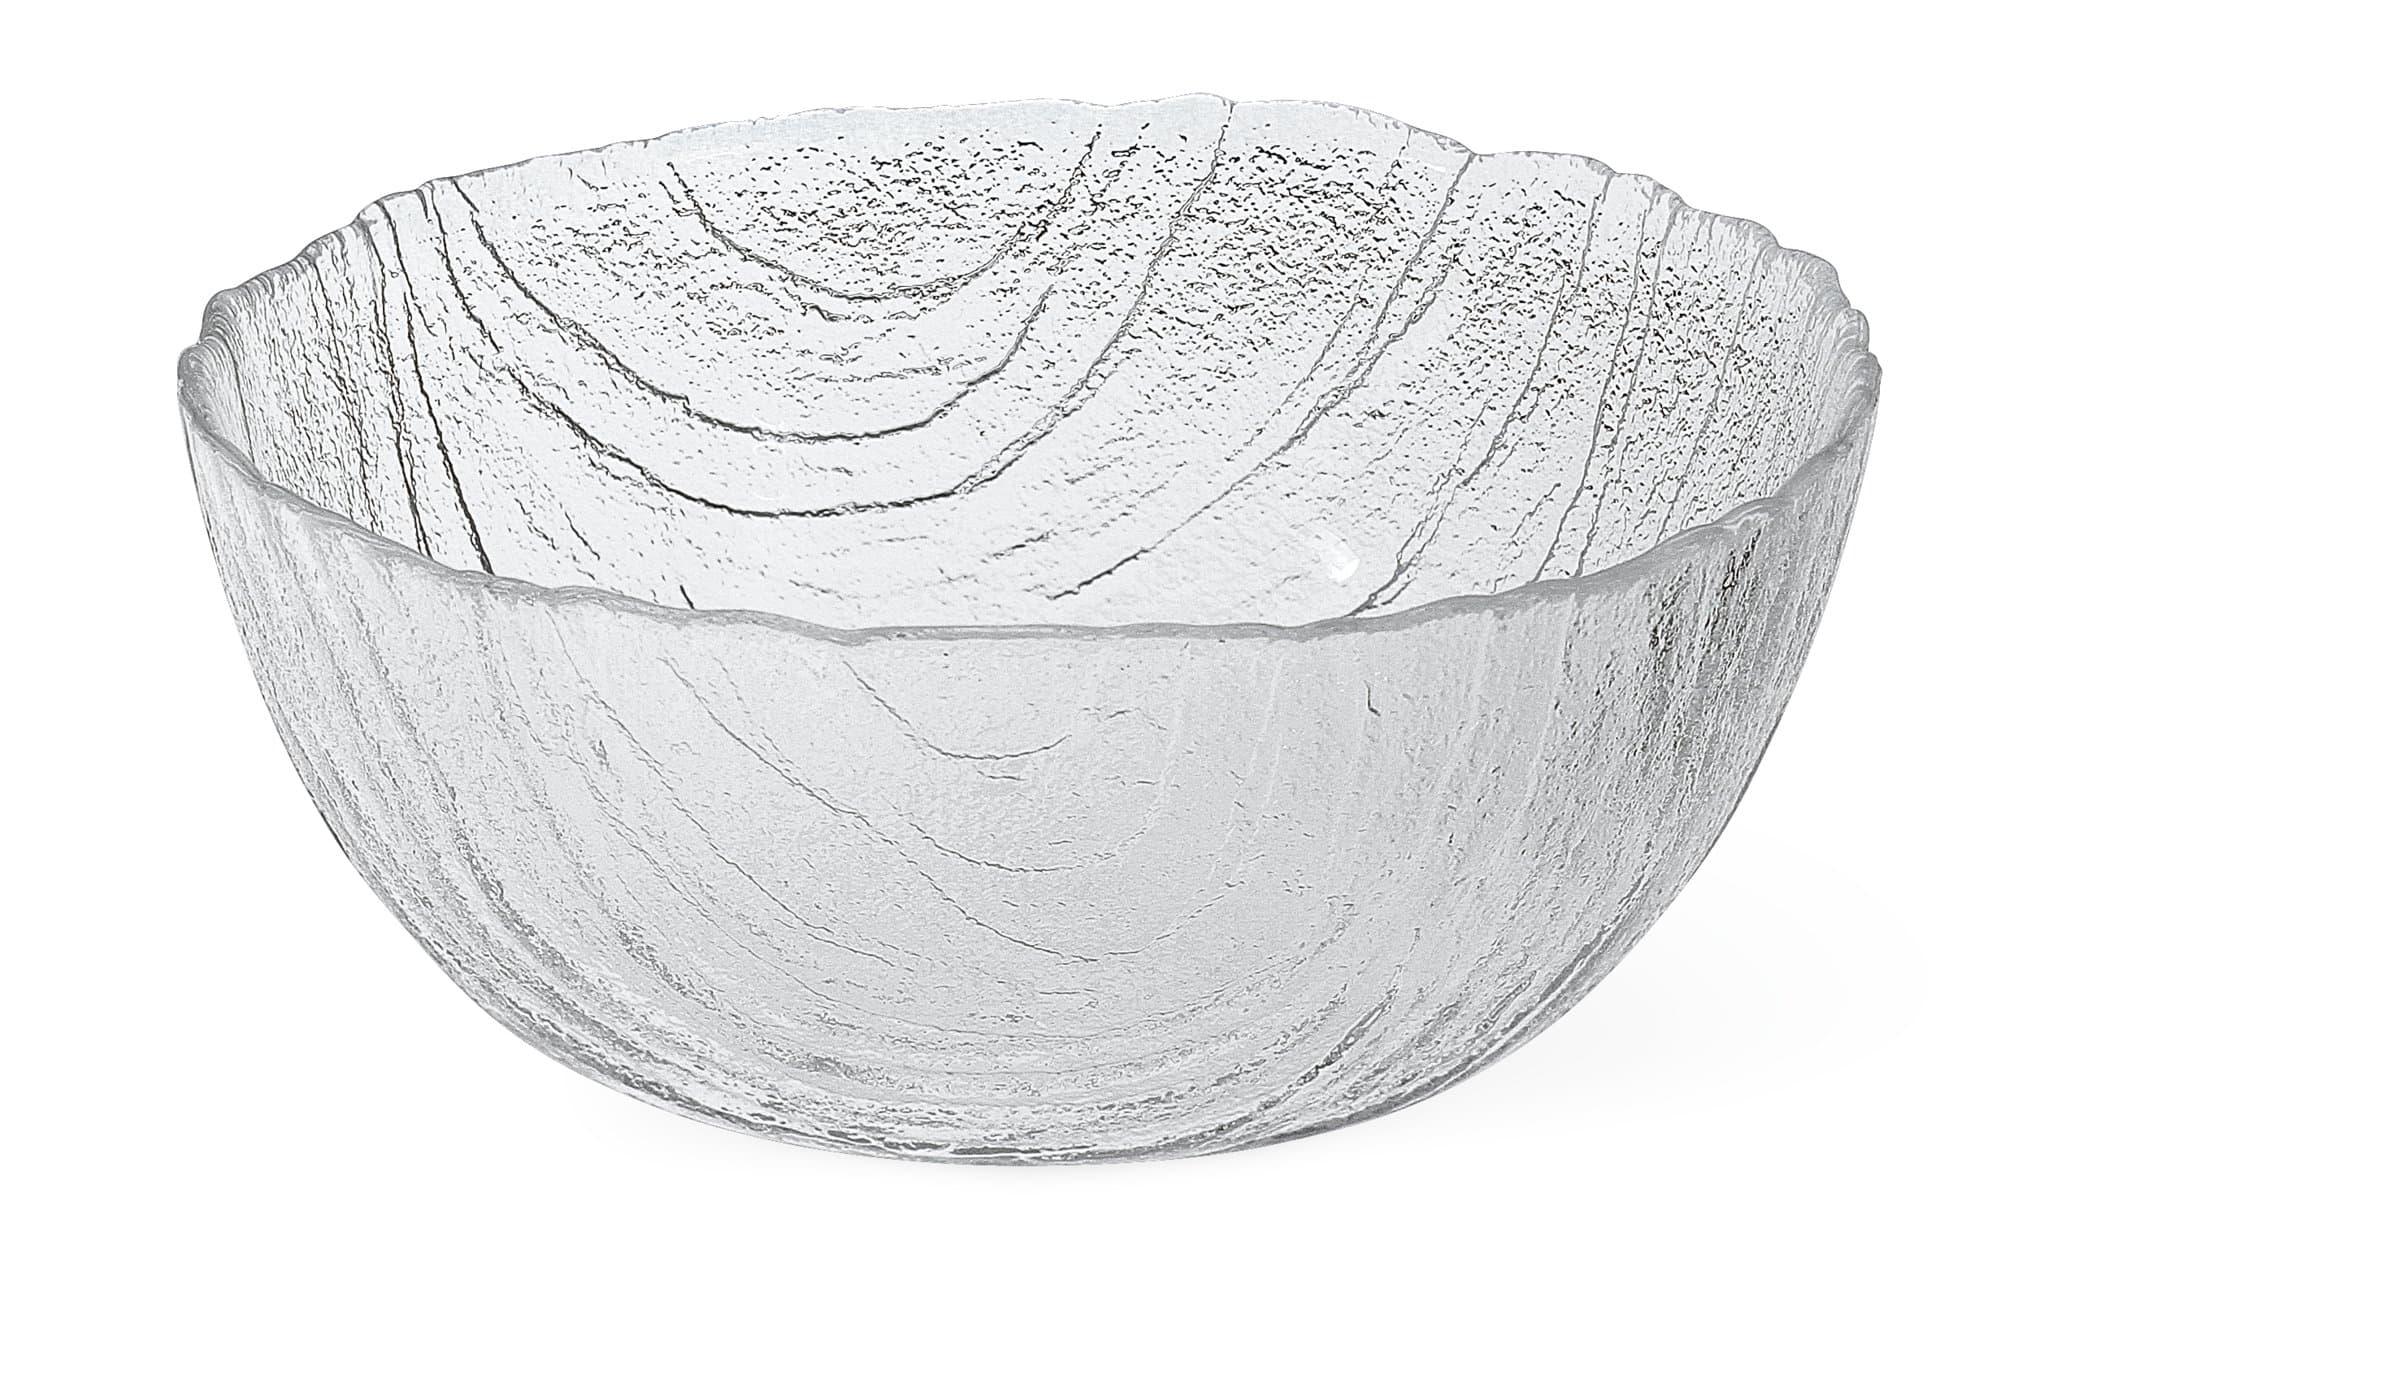 Cucina & Tavola VOLCANO Schale 13cm